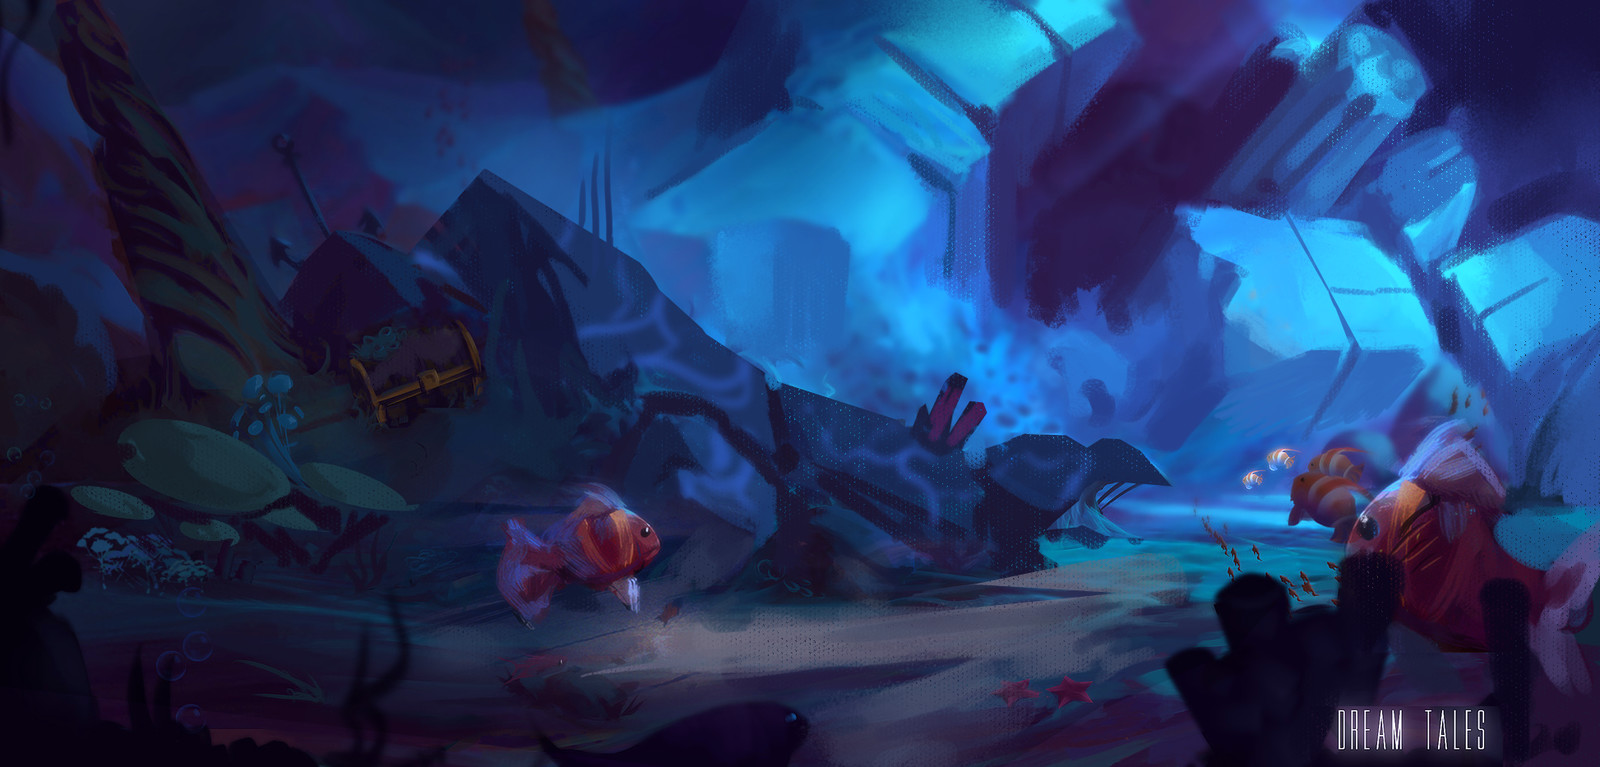 Dream Tales - underwater